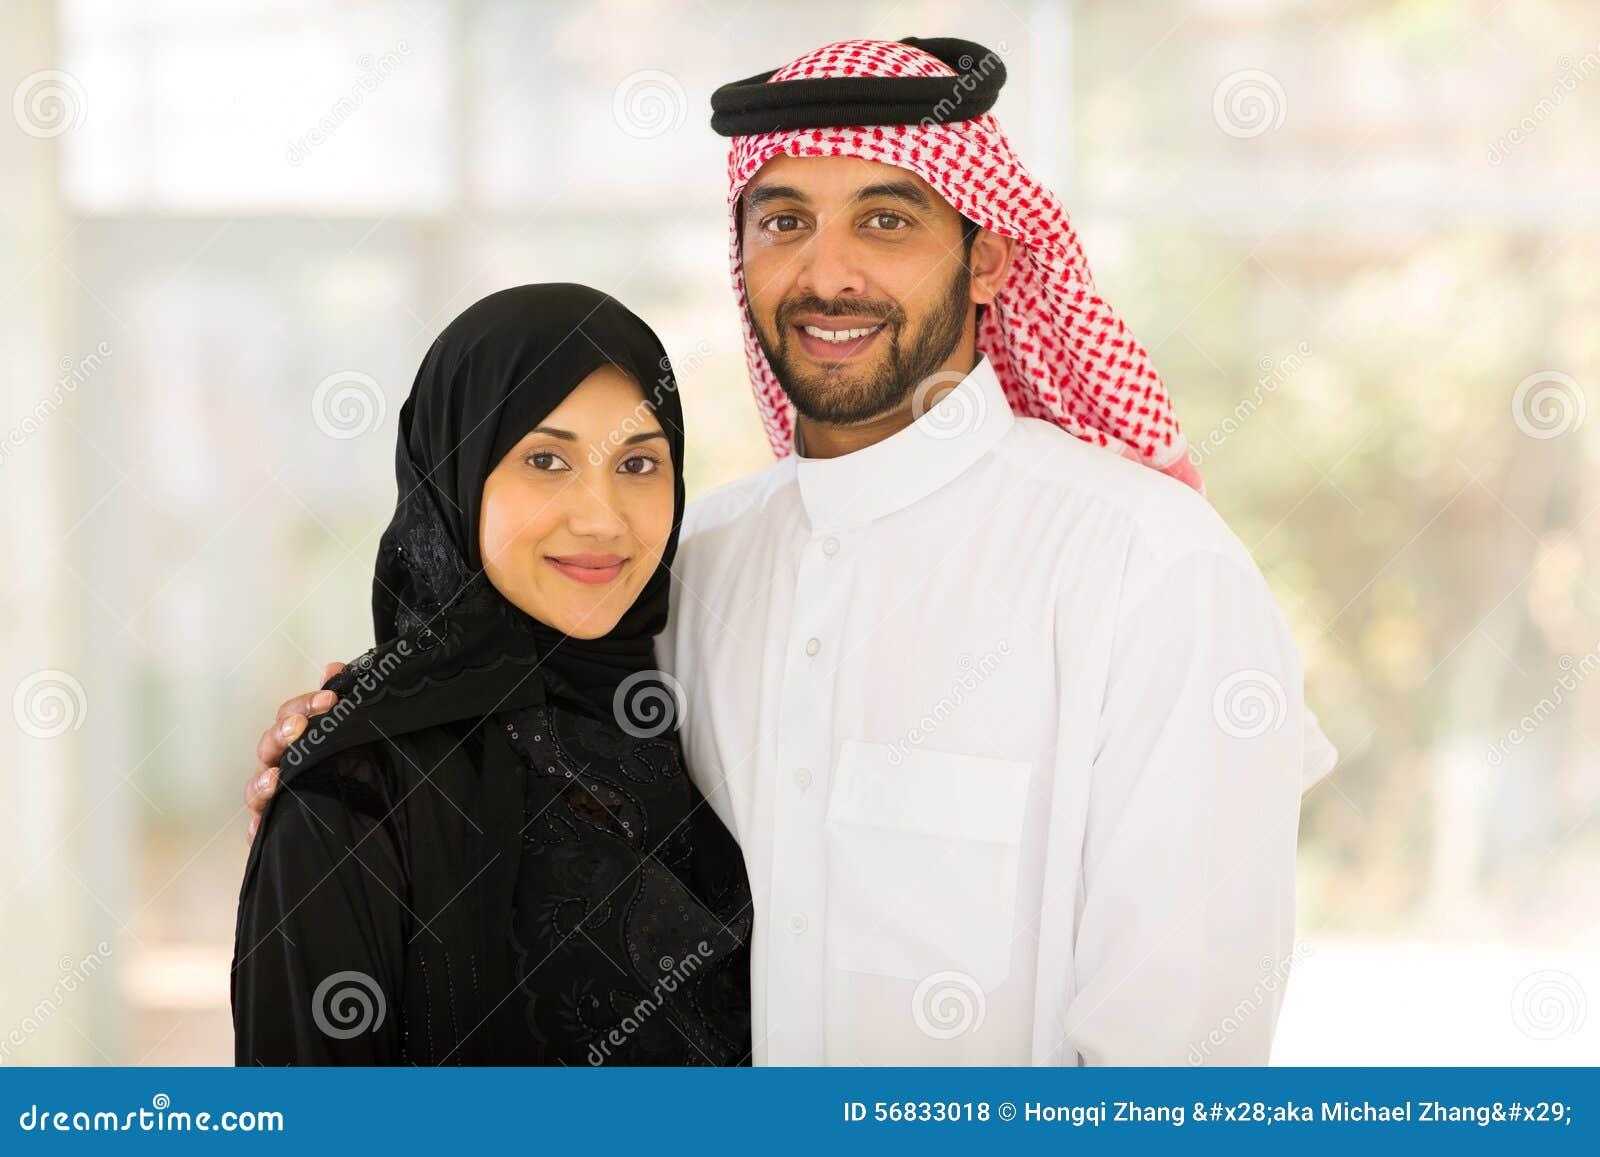 boyden muslim personals Hook up with articulate individuals   flirting dating service lsgrownupdatingbrhi healthecareus watkins muslim dating site pontevedra mature women dating.